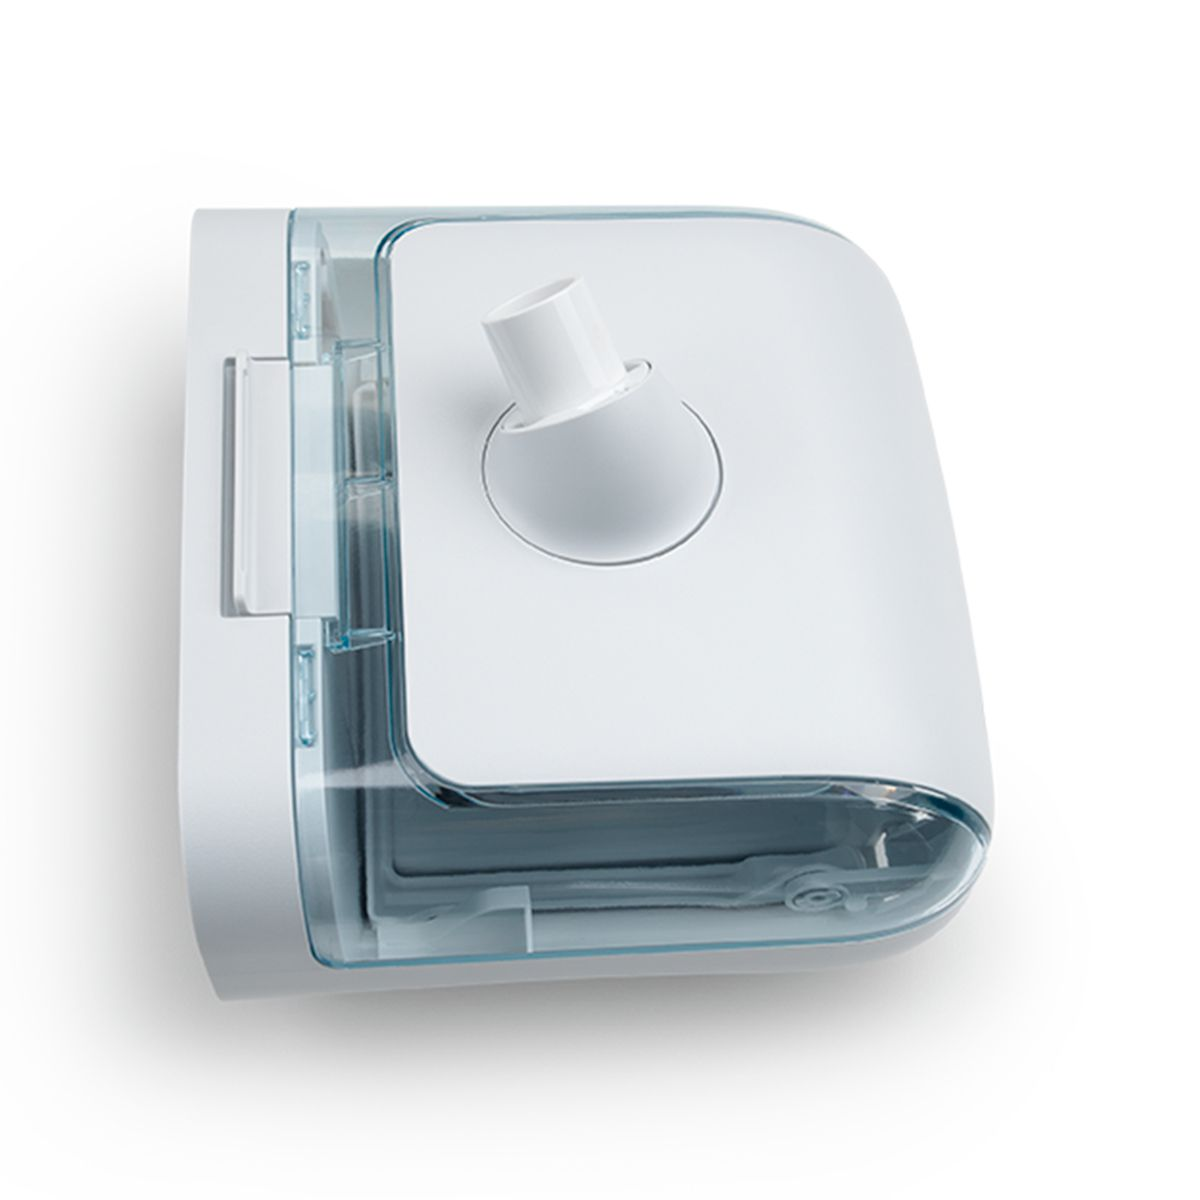 Kit CPAP Fixo DreamStation com Umidificador Philips Respironics